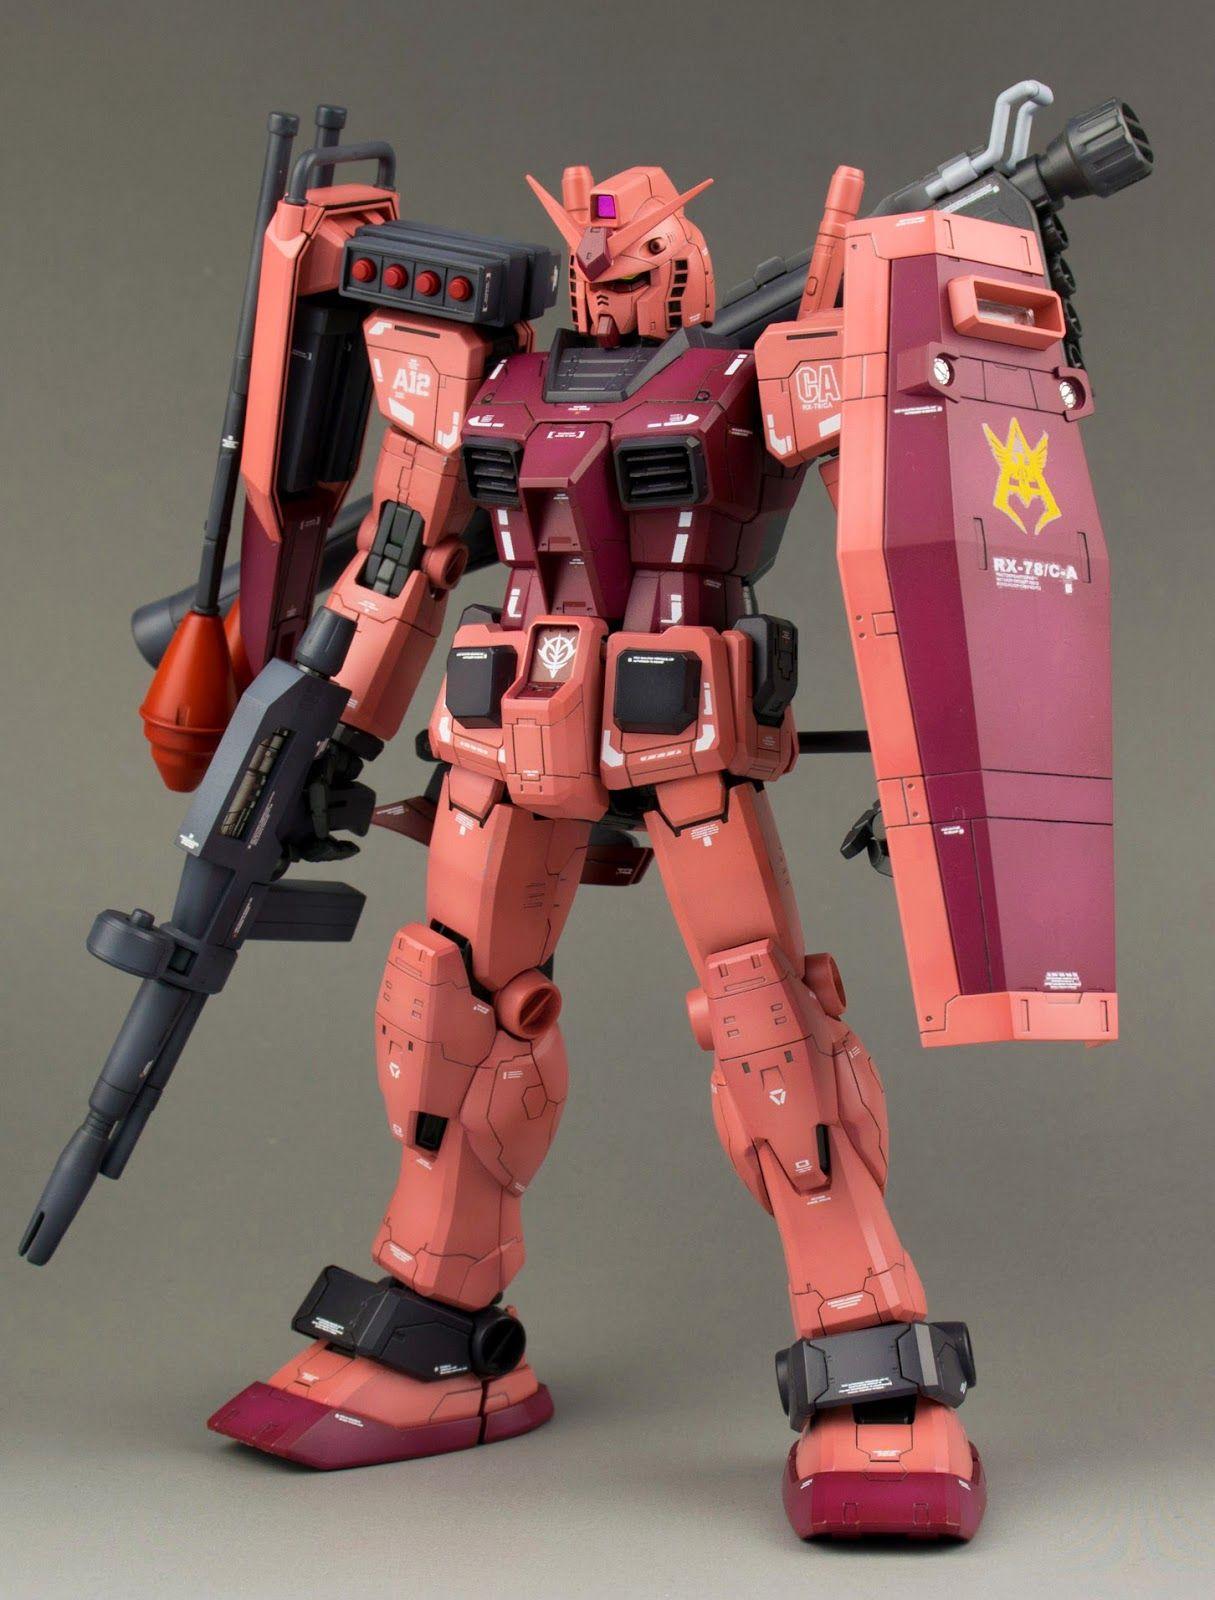 RX-78 CA GUNDAM GUY: MG 1/100 RX-78/C.A. Char Aznable's Customized Gundam